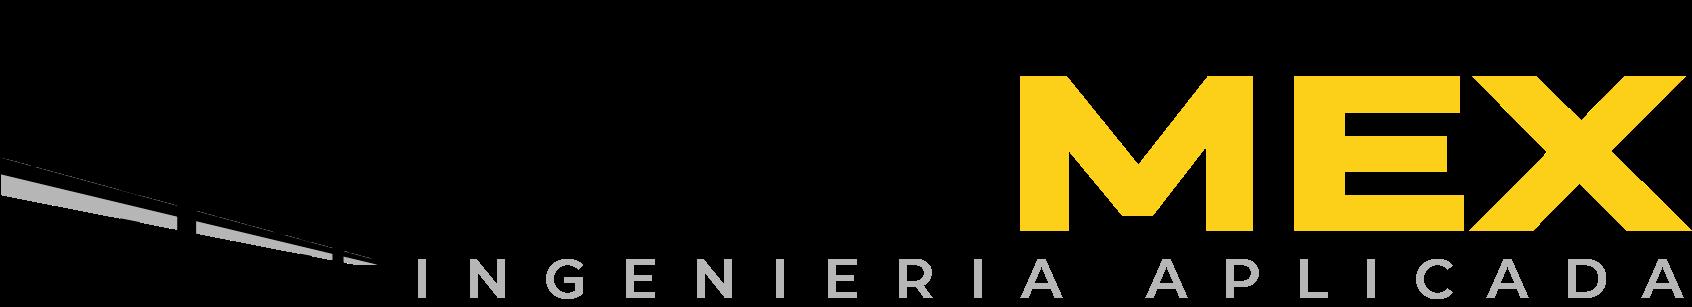 SERMEX Ingeniería Aplicada